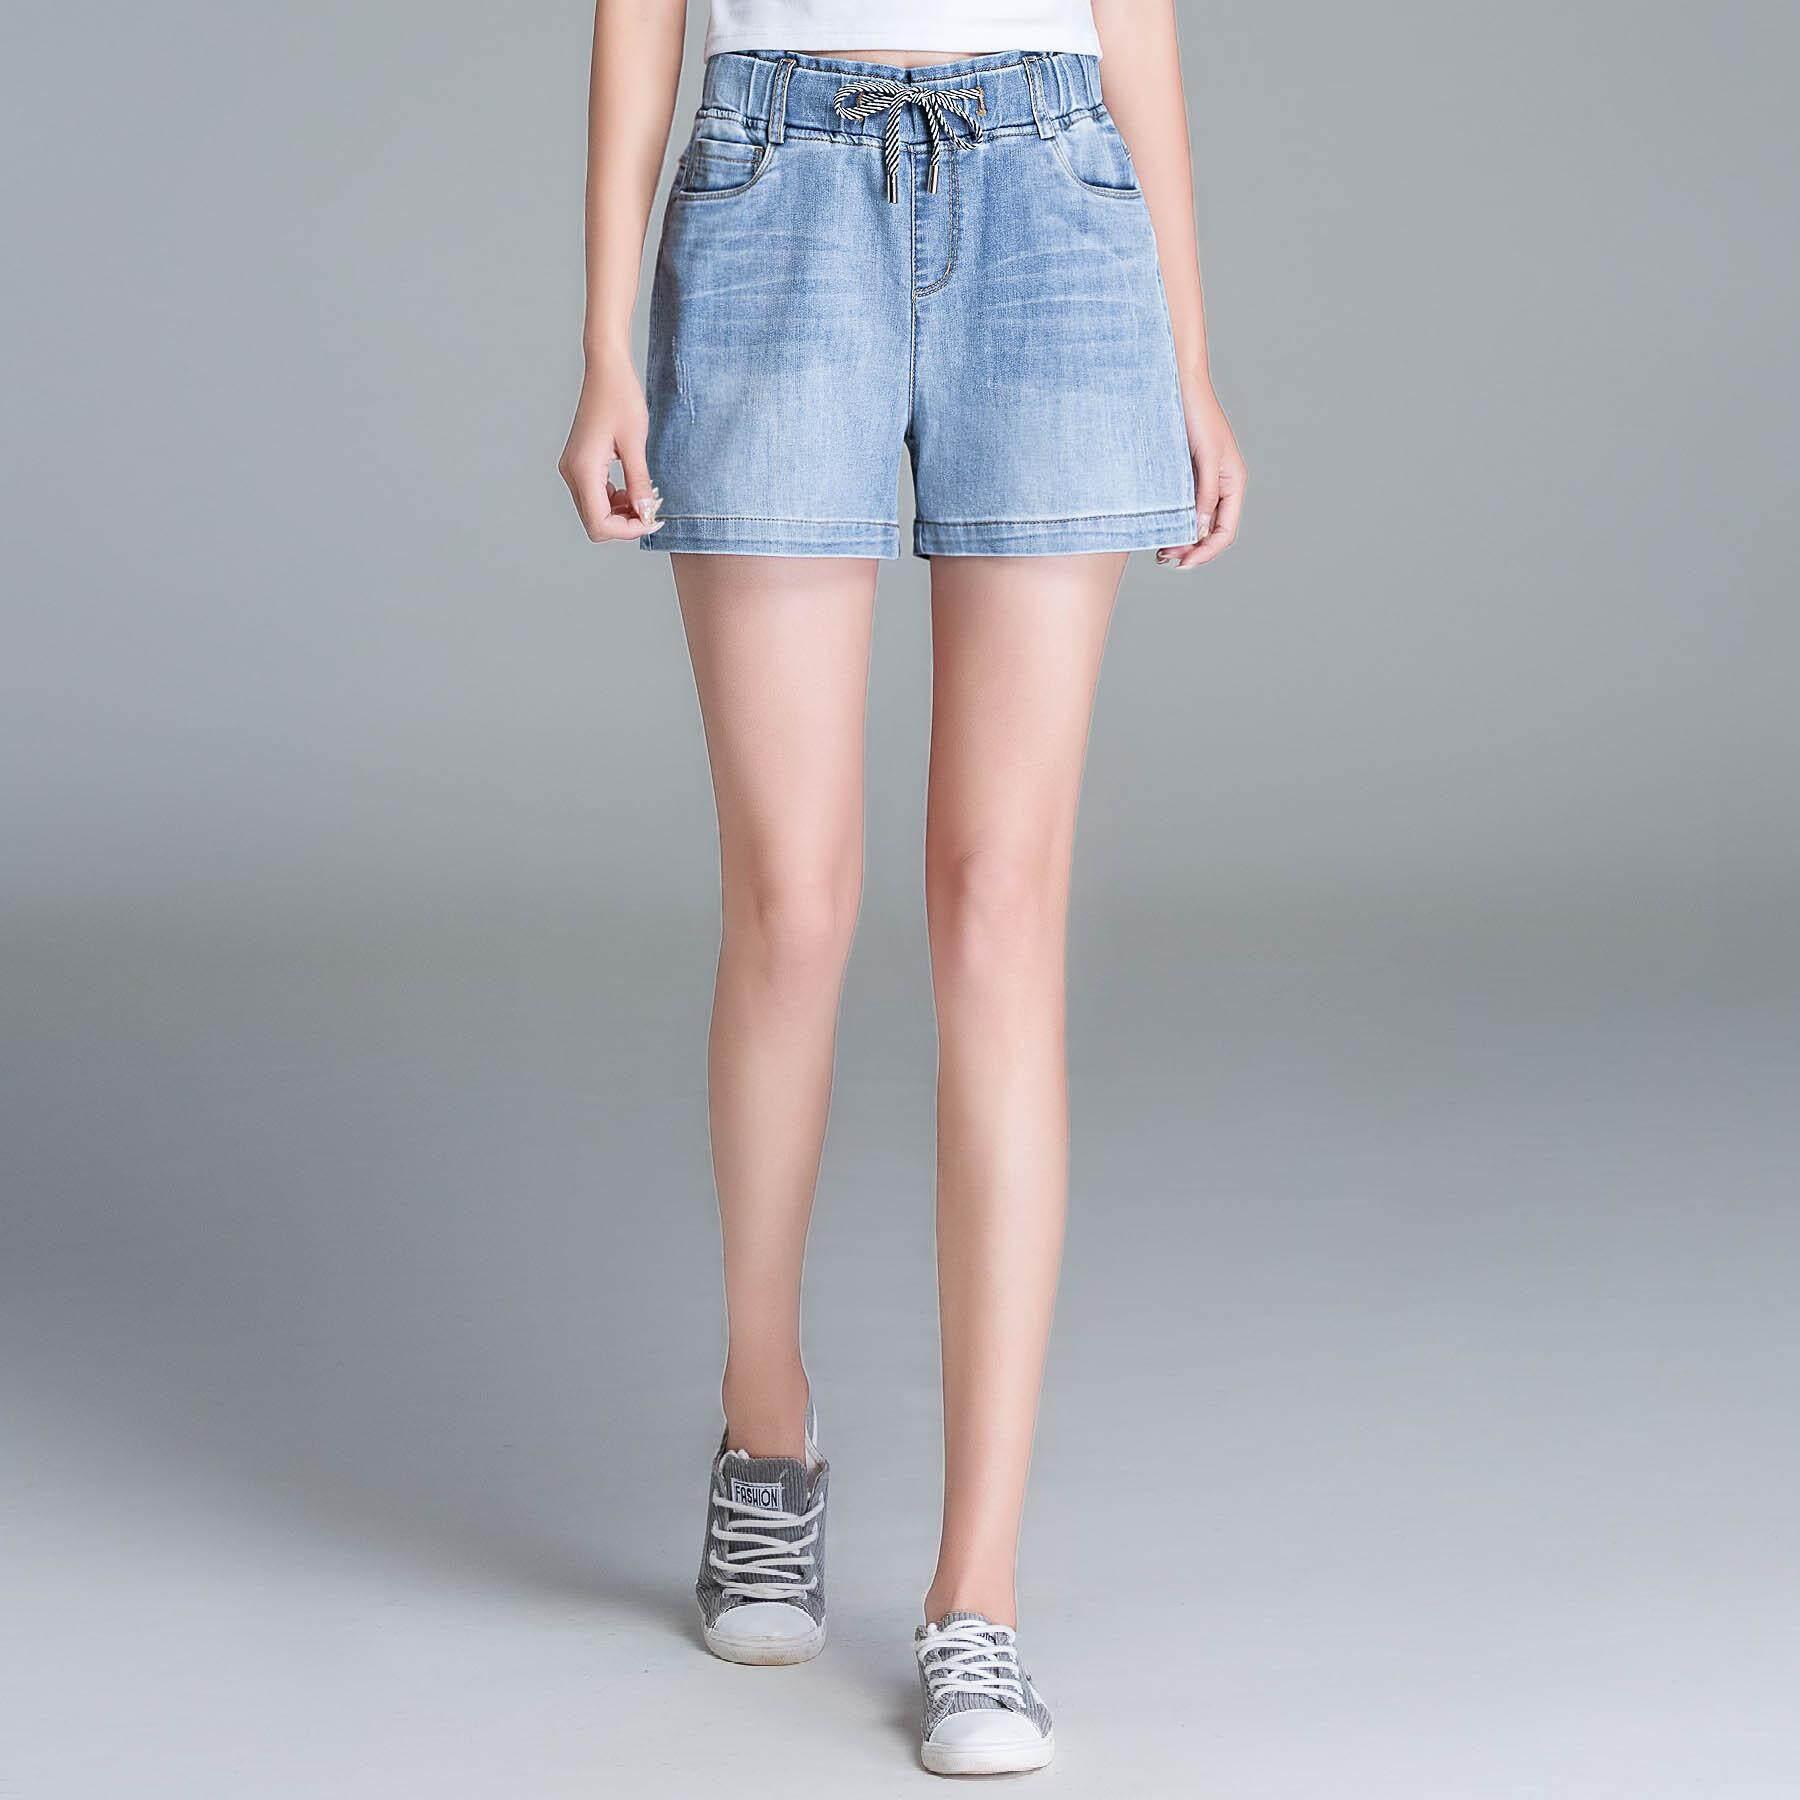 Women Elastic Waist Jeans Shorts Summer Wide Leg Denim Shorts Loose Straight Casual Pants